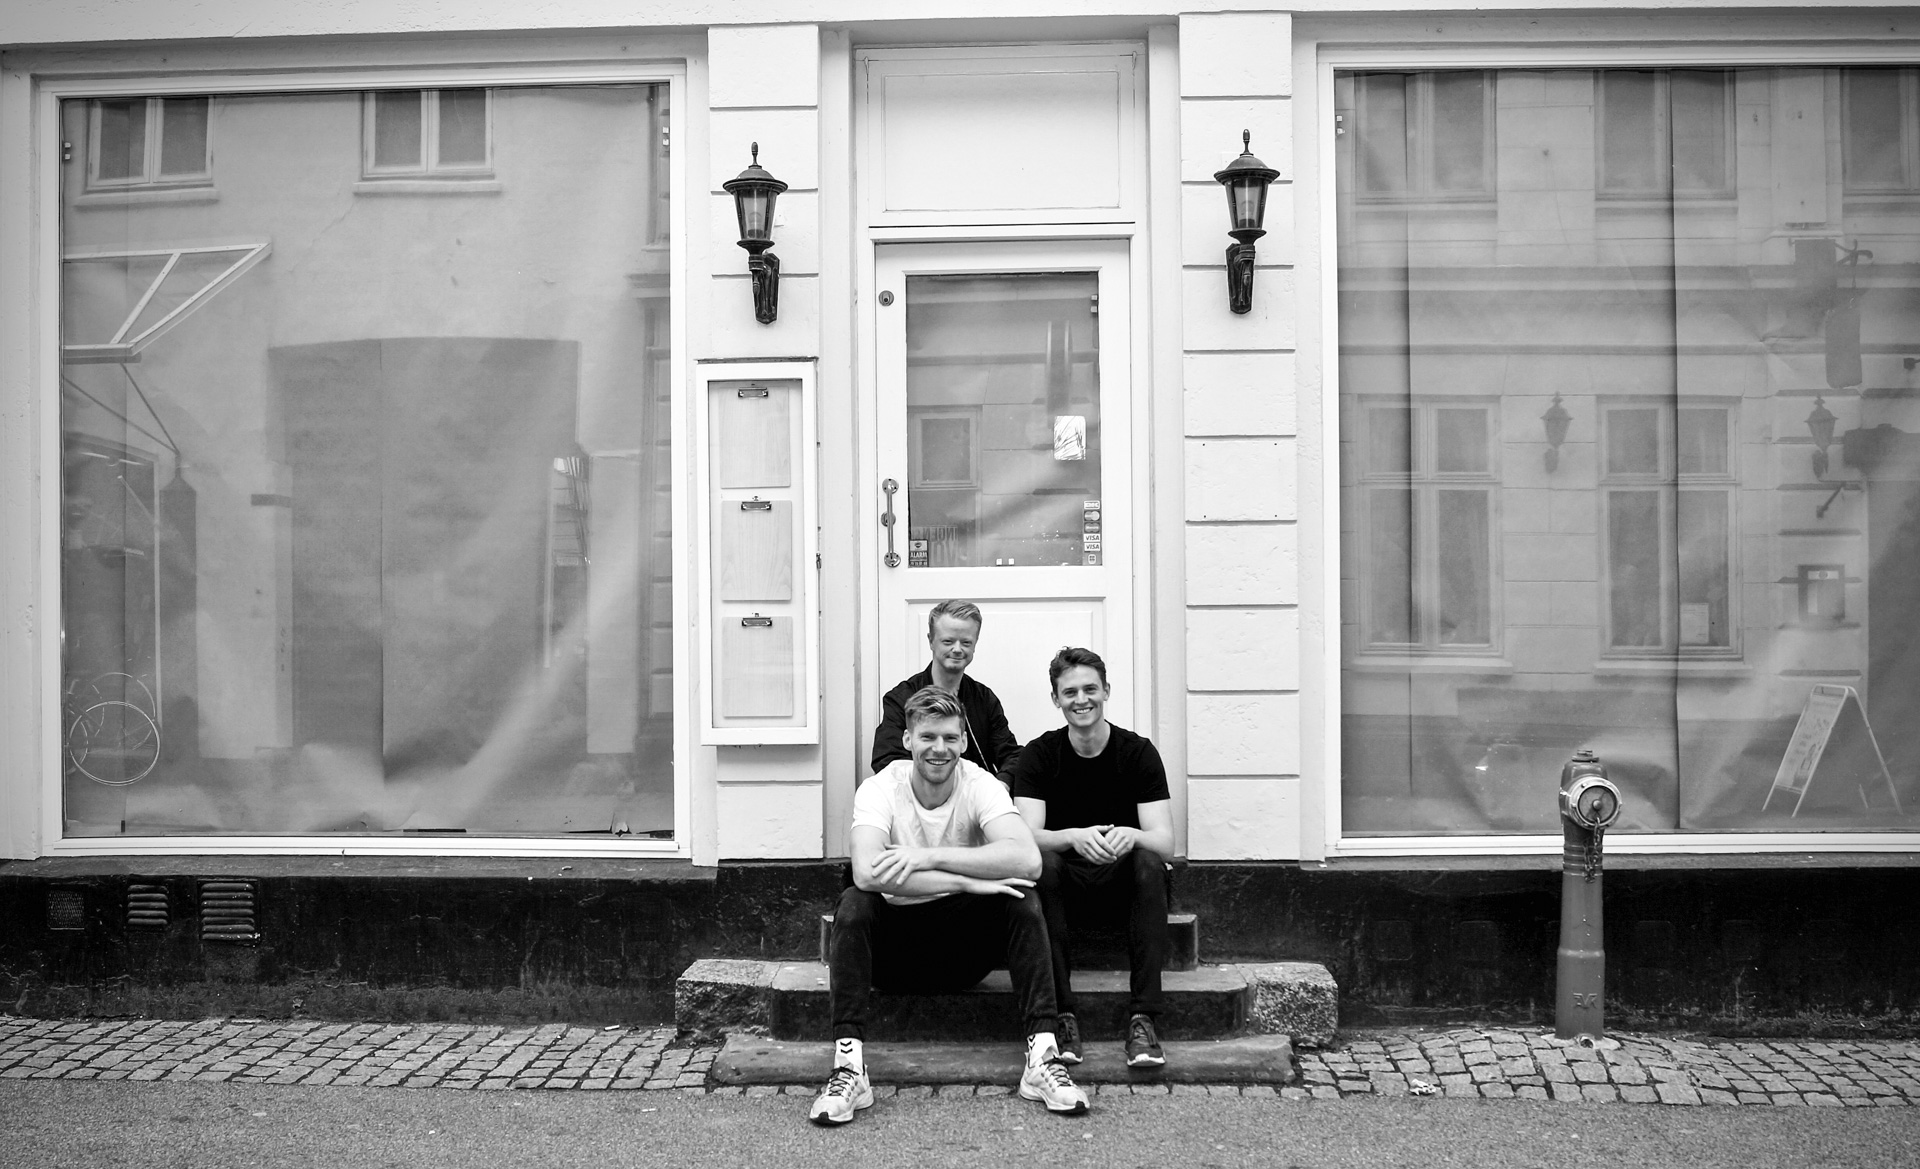 Ny social dining i Frederiksgade: Restaurant SYV NI 13 åbner i Substans' gamle lokaler